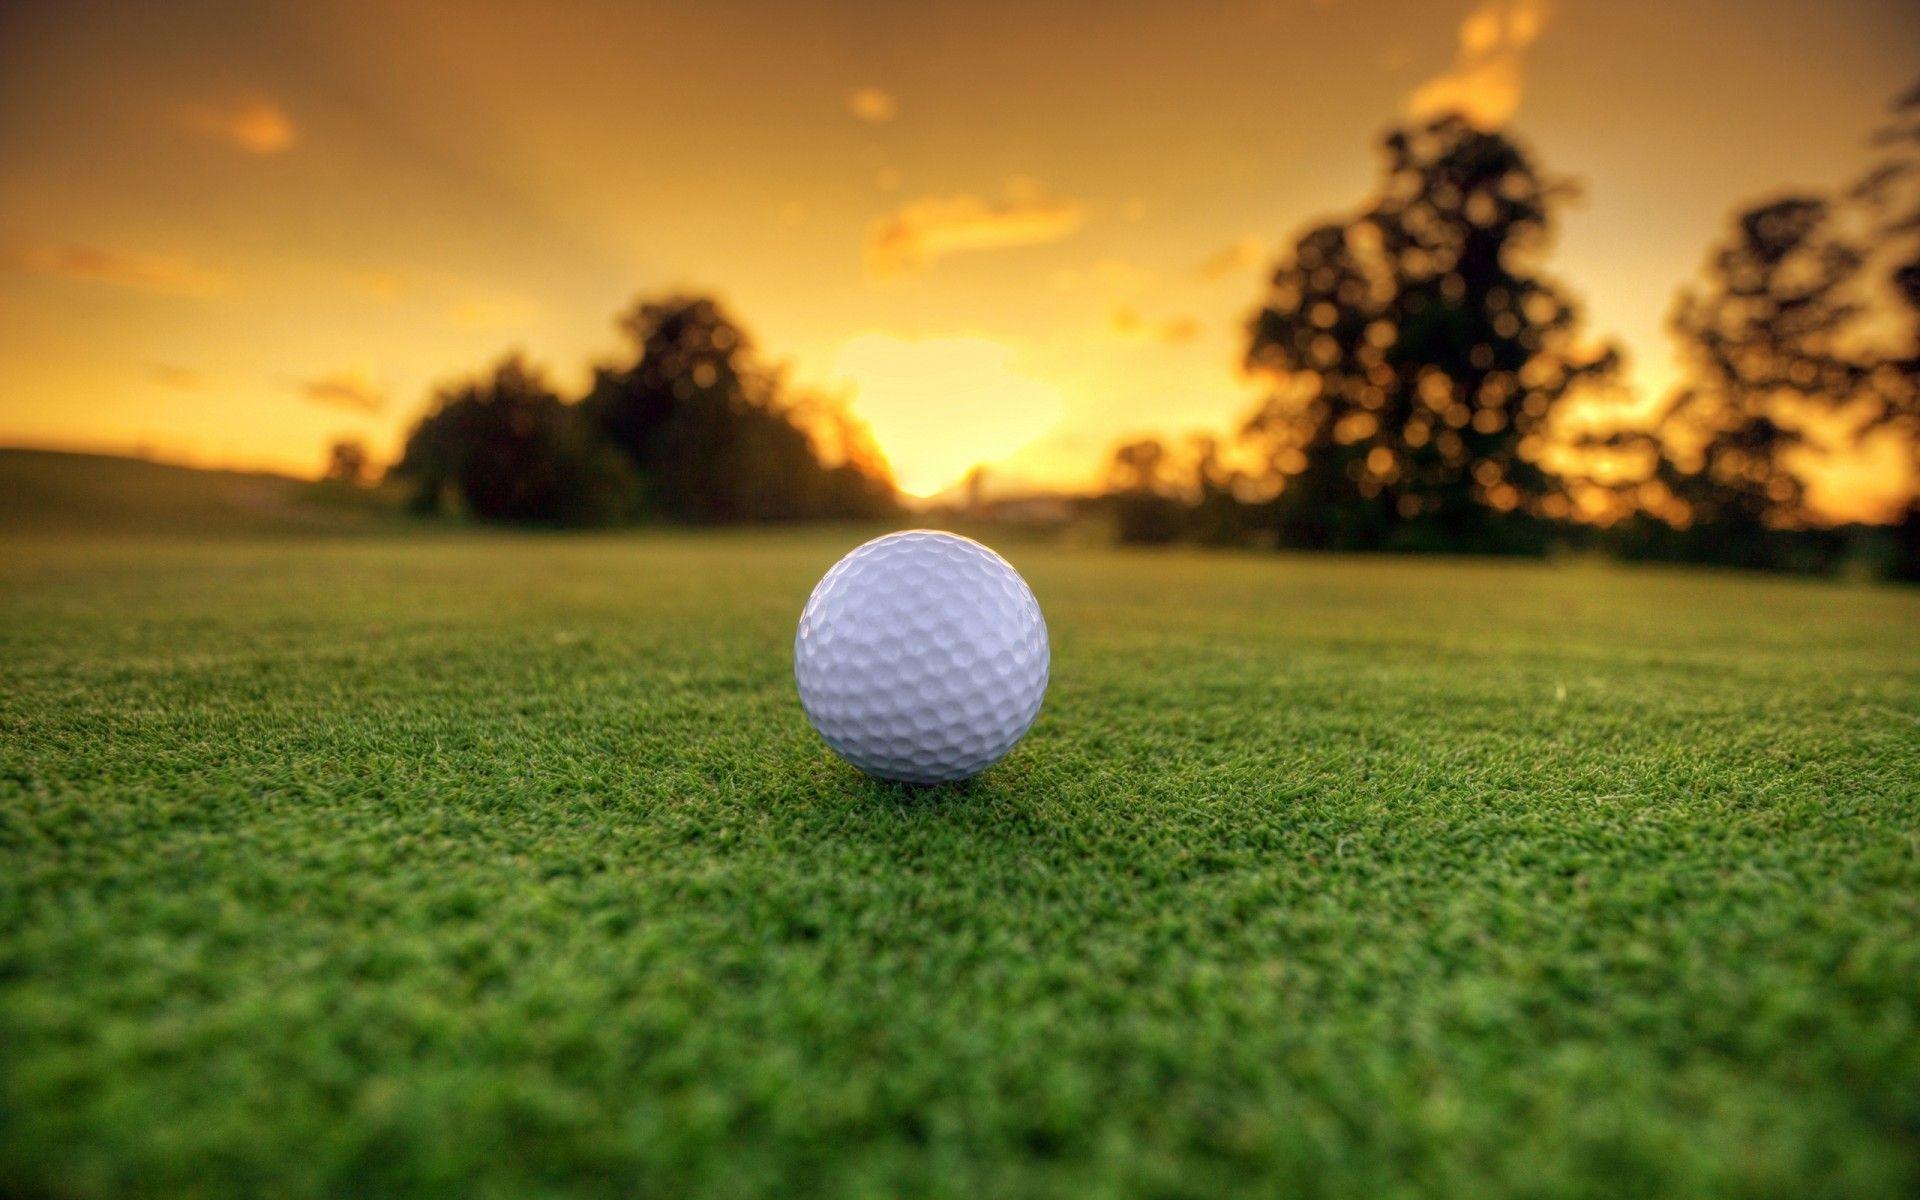 Golf Ball Wallpapers Desktop Background On Tee Titleist Nike HD